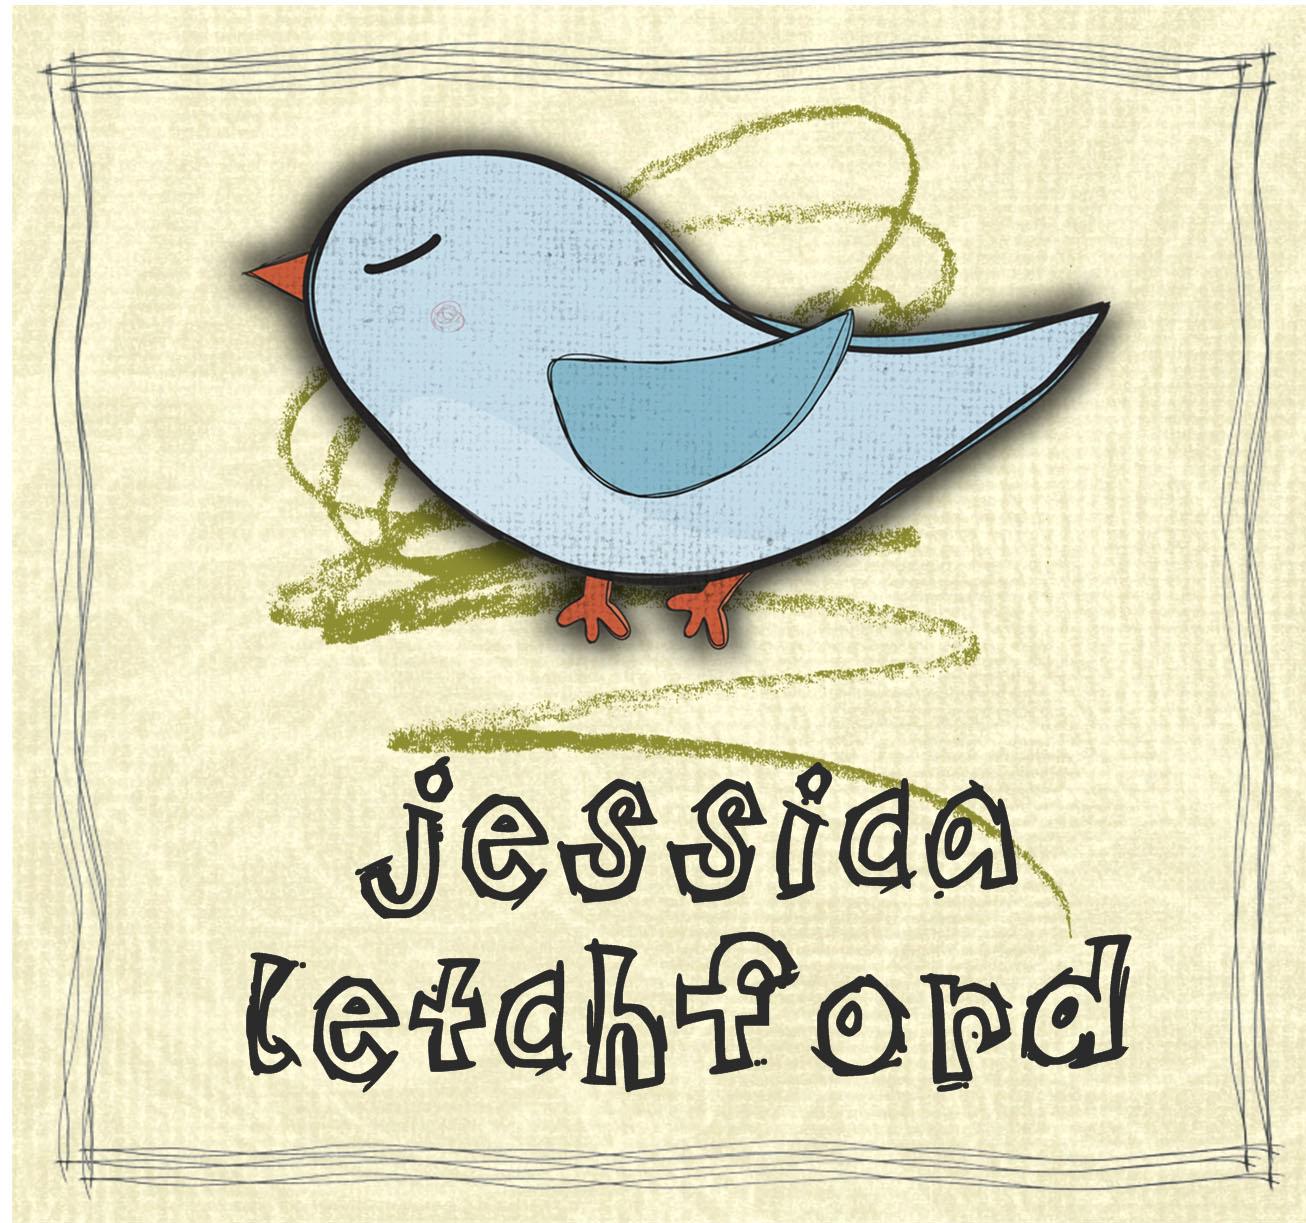 Jessica Letchford